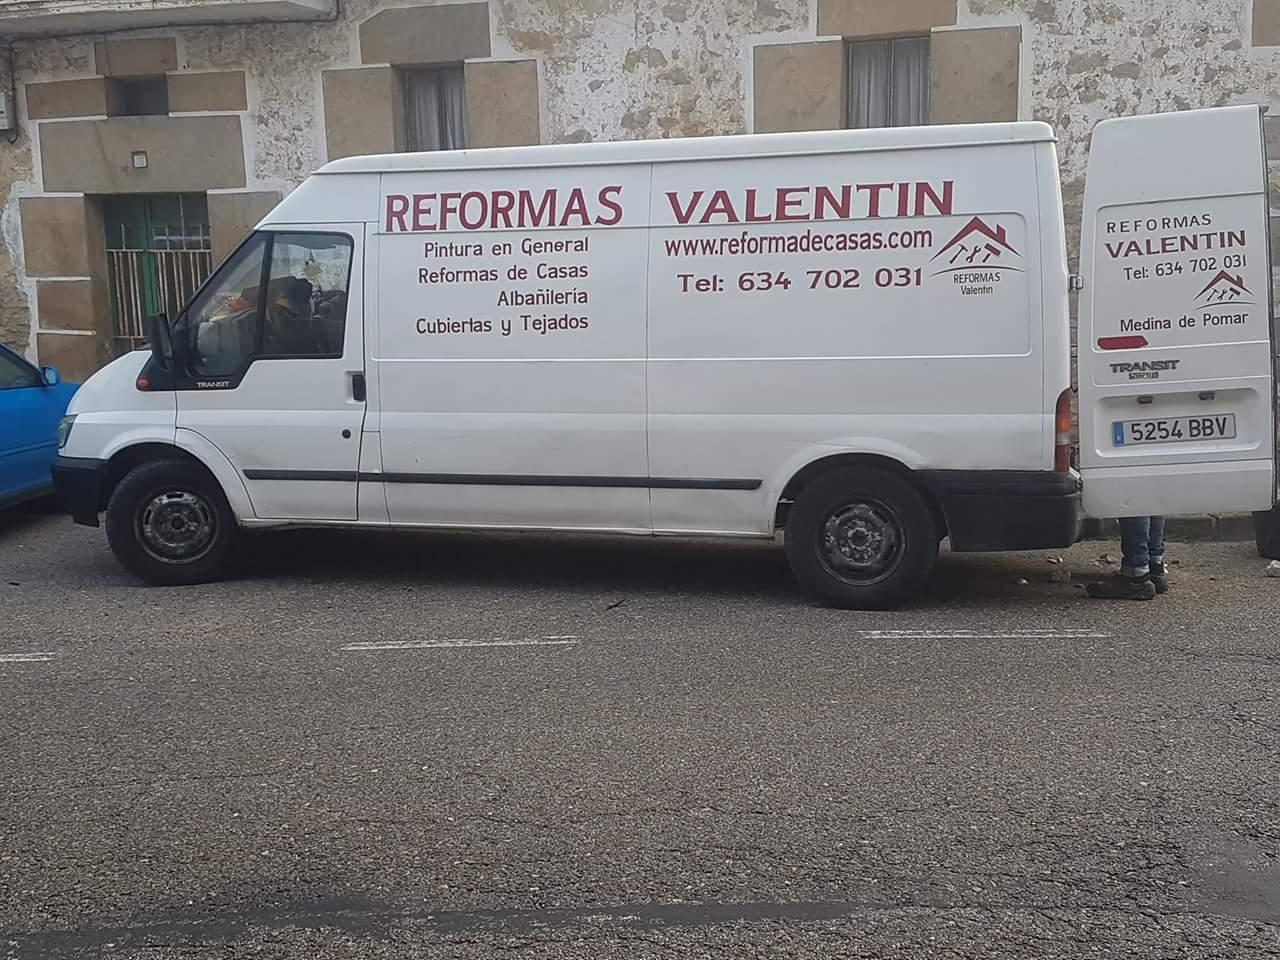 Reformas Valentin